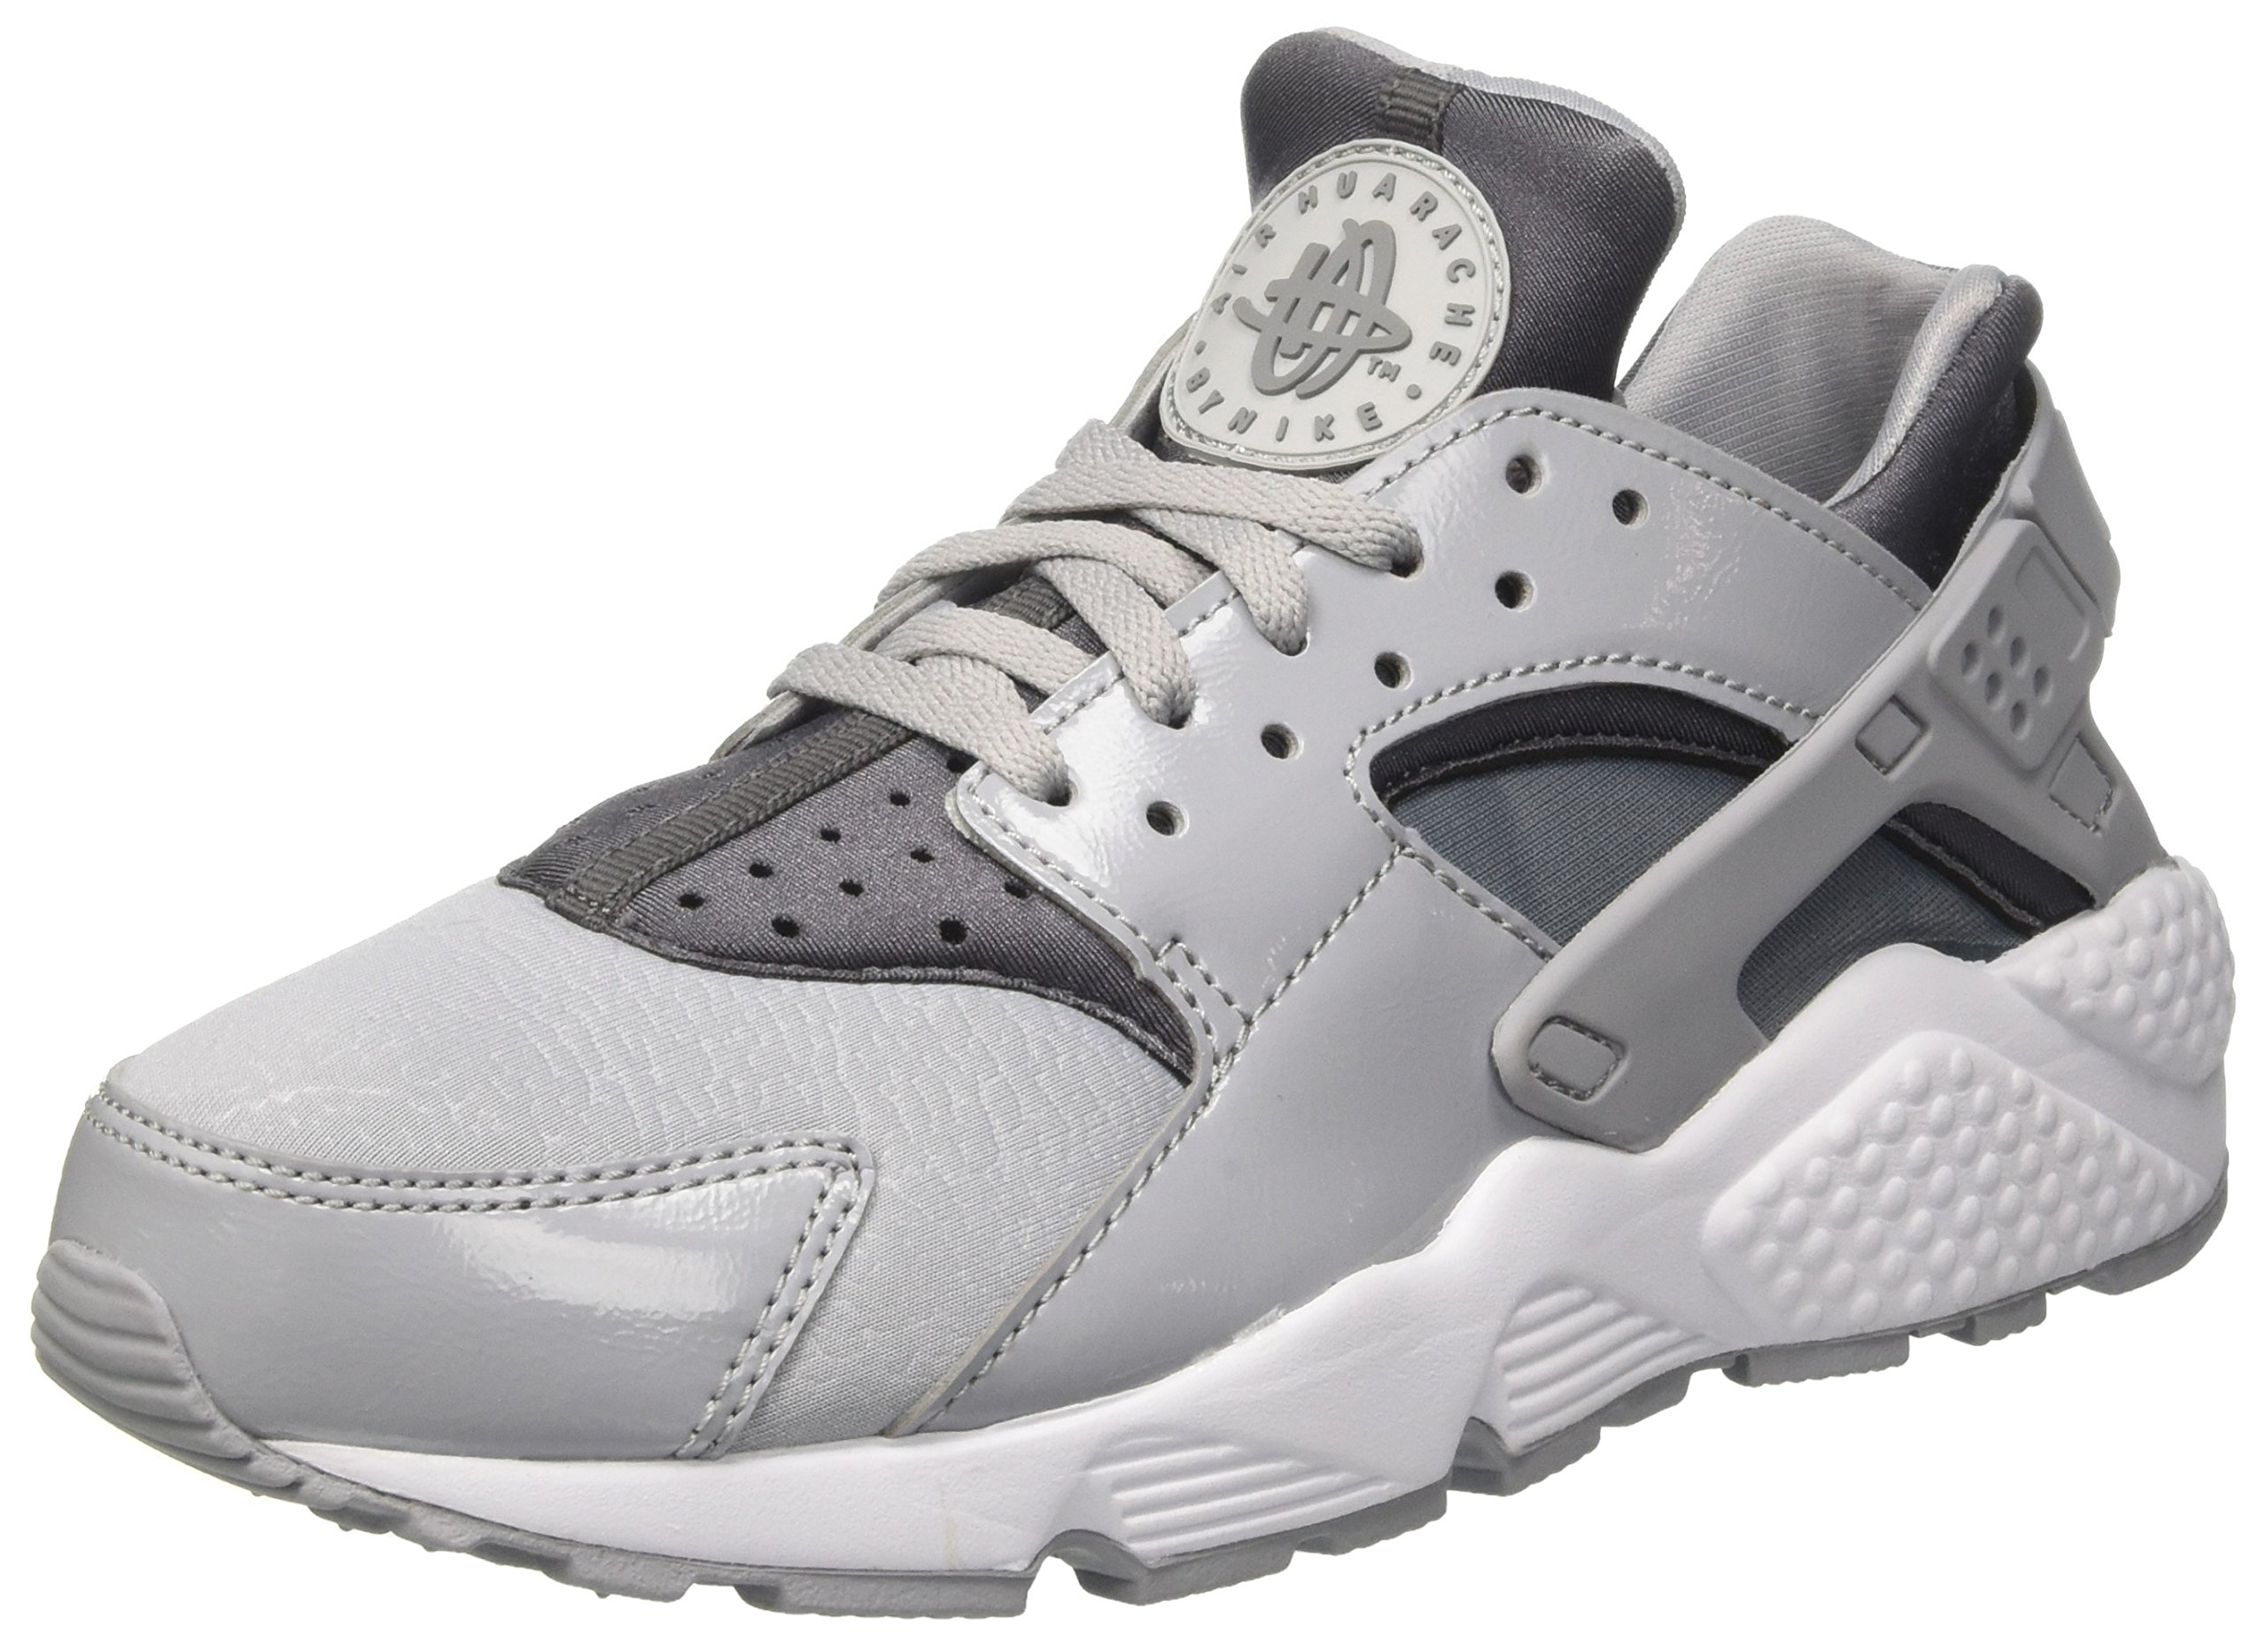 quality design 96260 a5a4d Galleon - Nike Air Huarache Run, Women's Low-Top Sneakers, Grey (Wolf Grey/Cool  Grey-Black), 7.5 UK (42 EU)